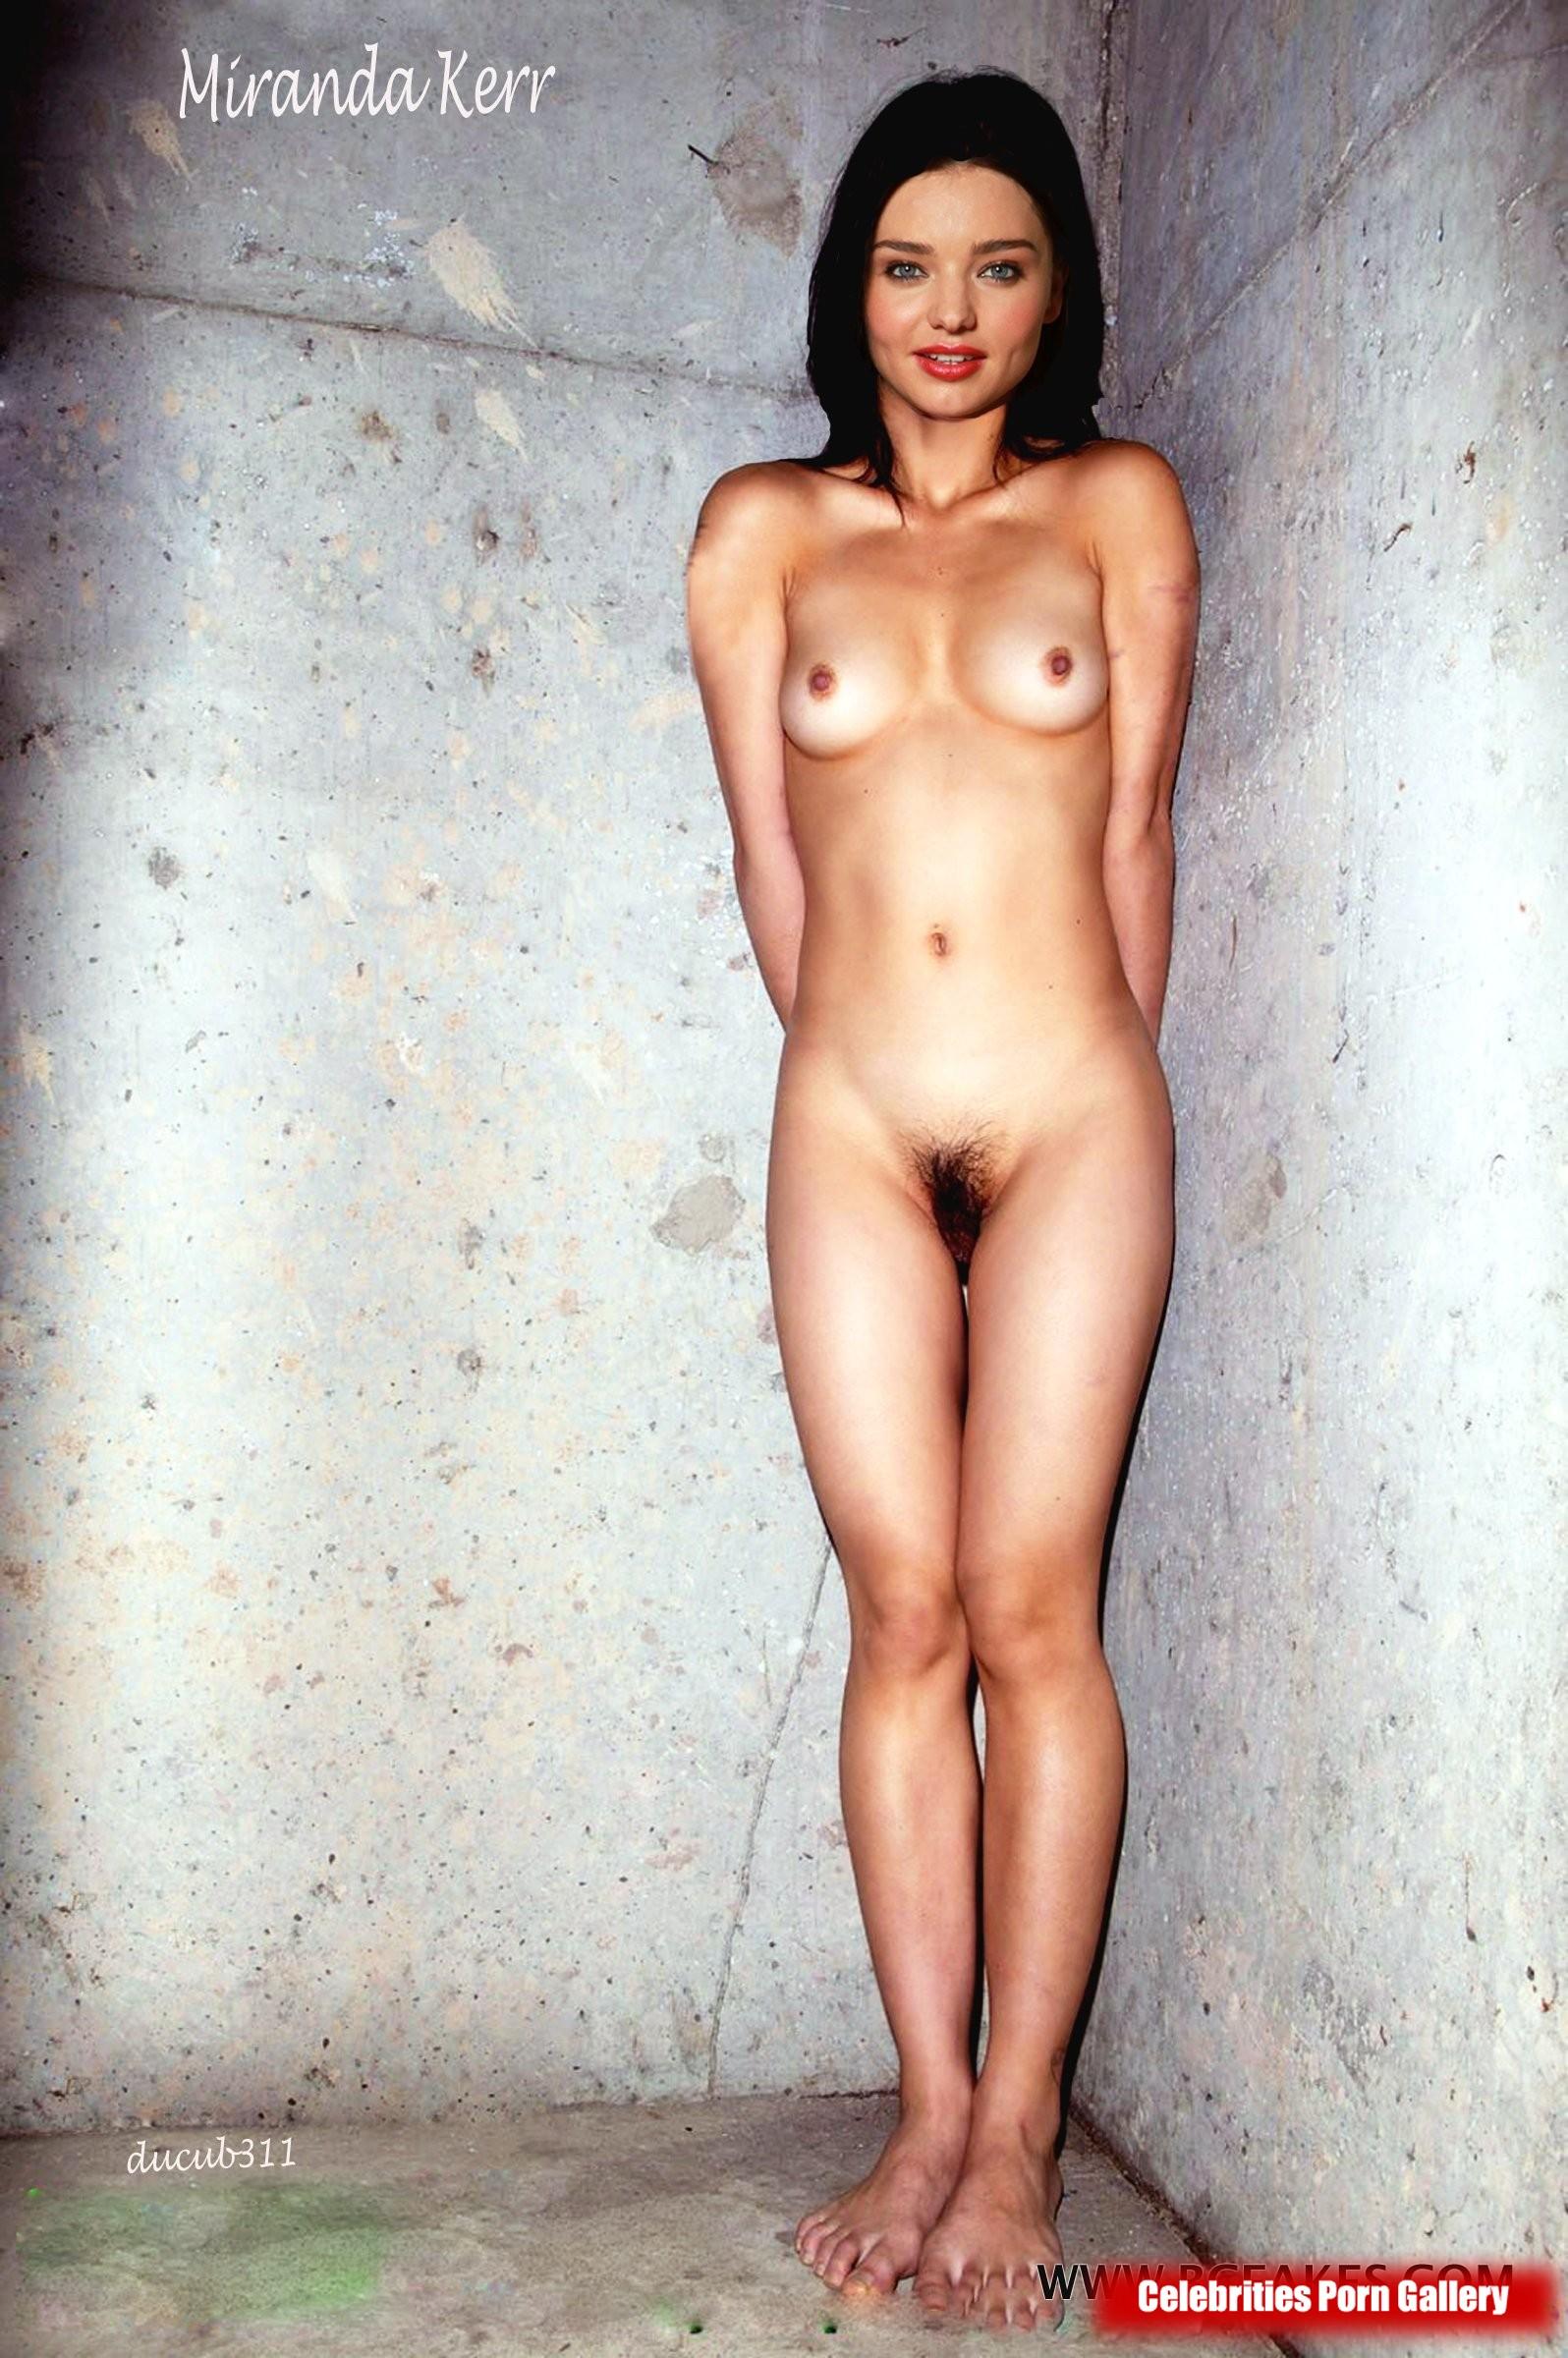 Alice Kerr Porn miranda kerr naked celebritys » miranda-kerr-nude-celebs-img